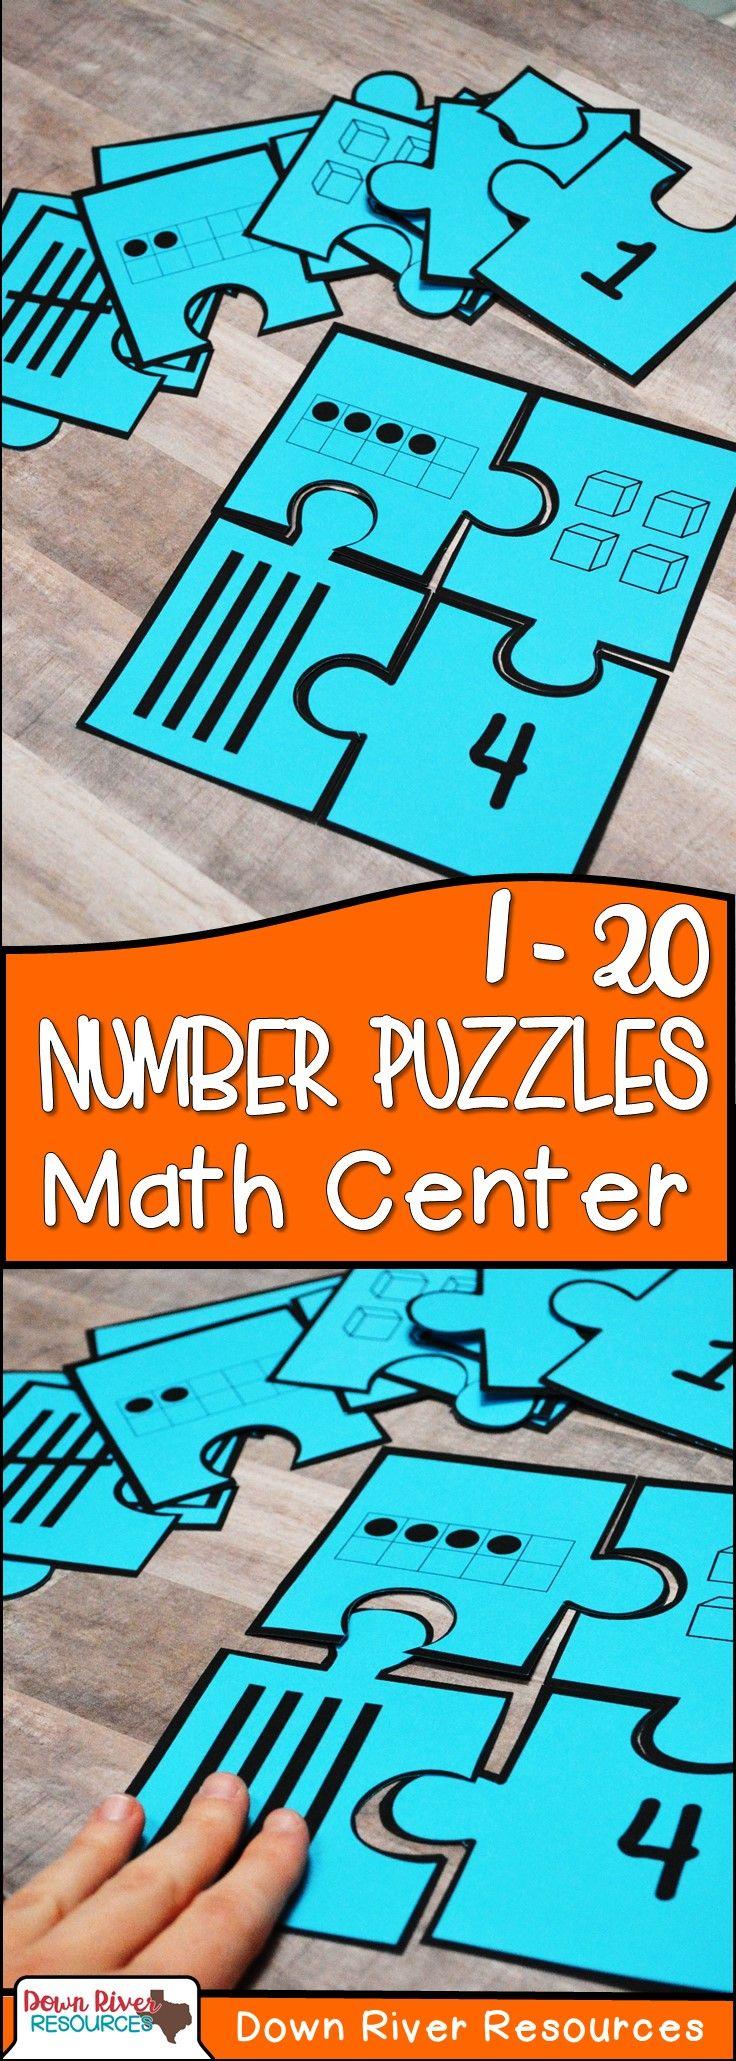 174 best Matemática images on Pinterest | Elementary schools, Math ...